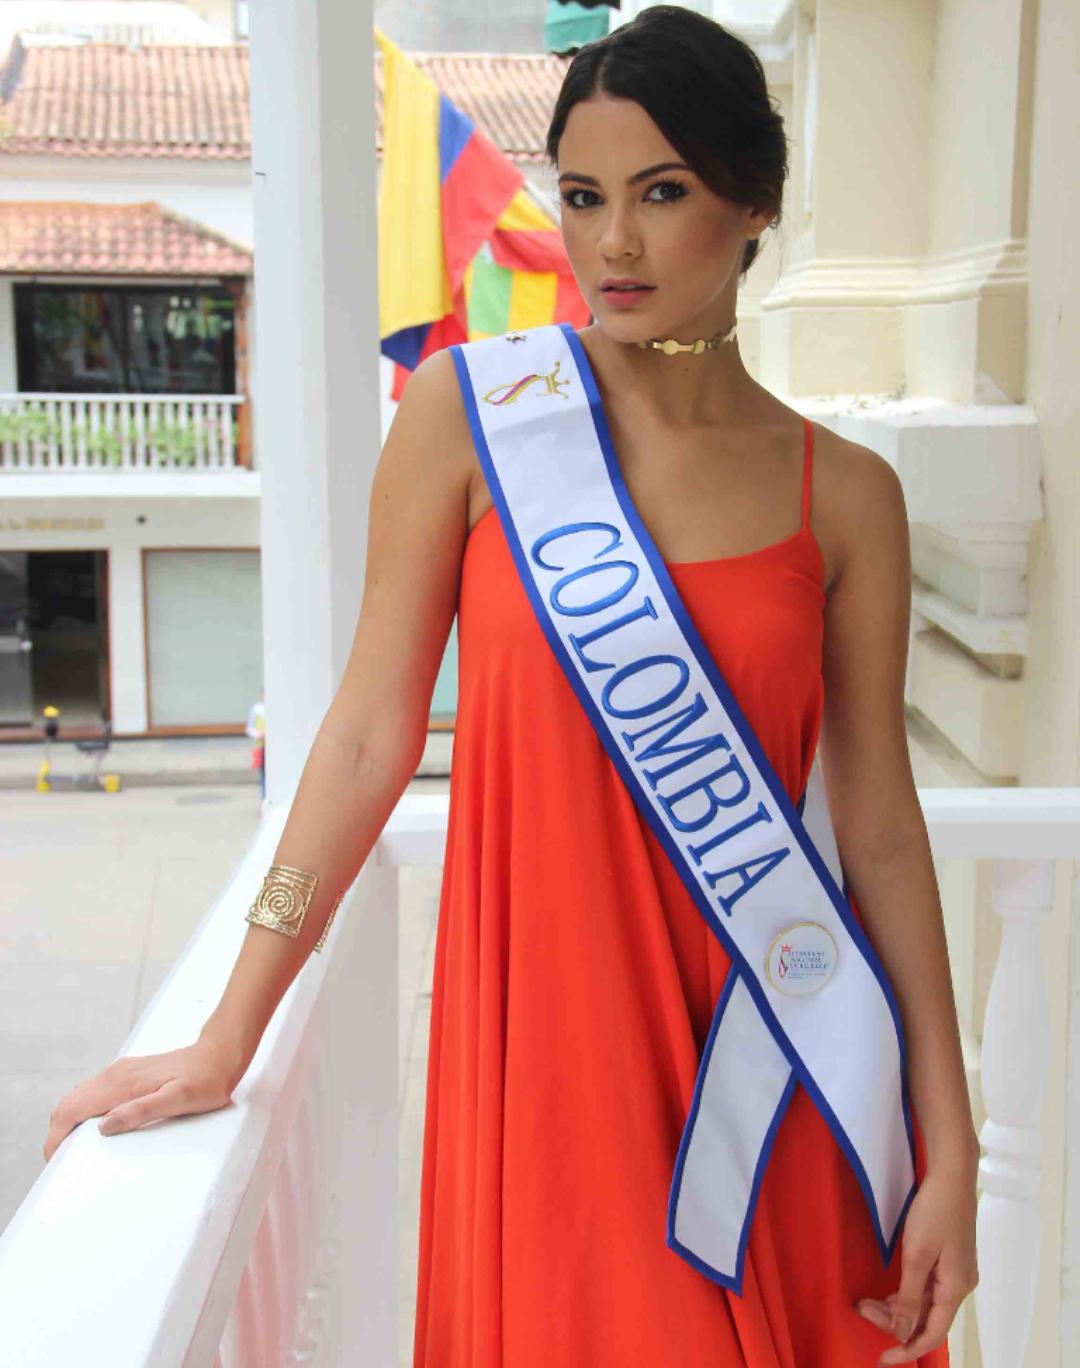 Ana Catalina Mouthon Porto rumbo a Miss Continentes Unidos